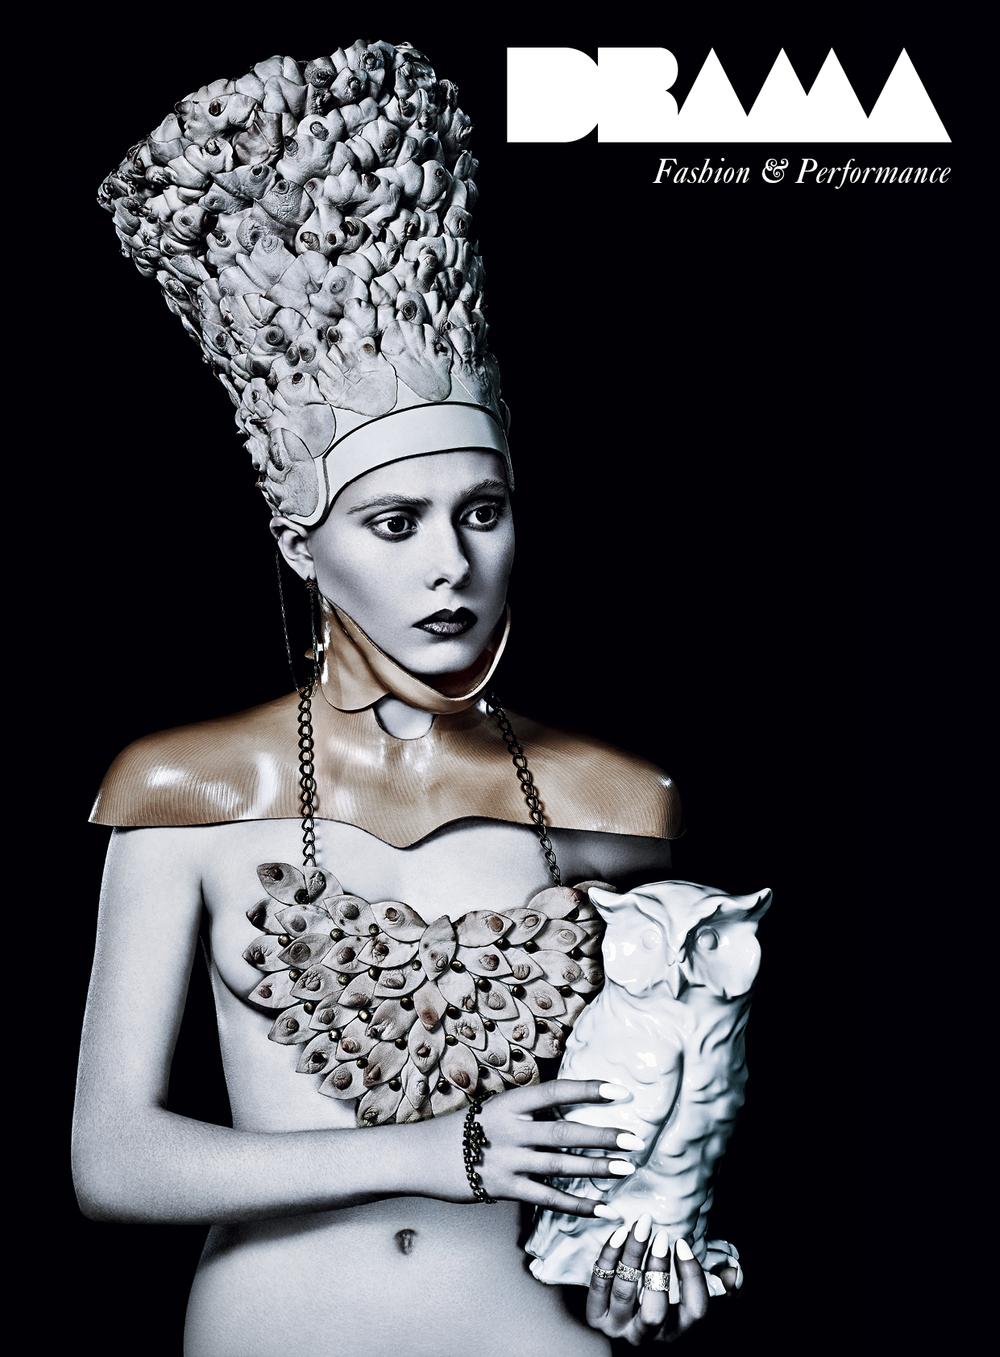 rachelfreire-dramamagazine7-cover.jpg